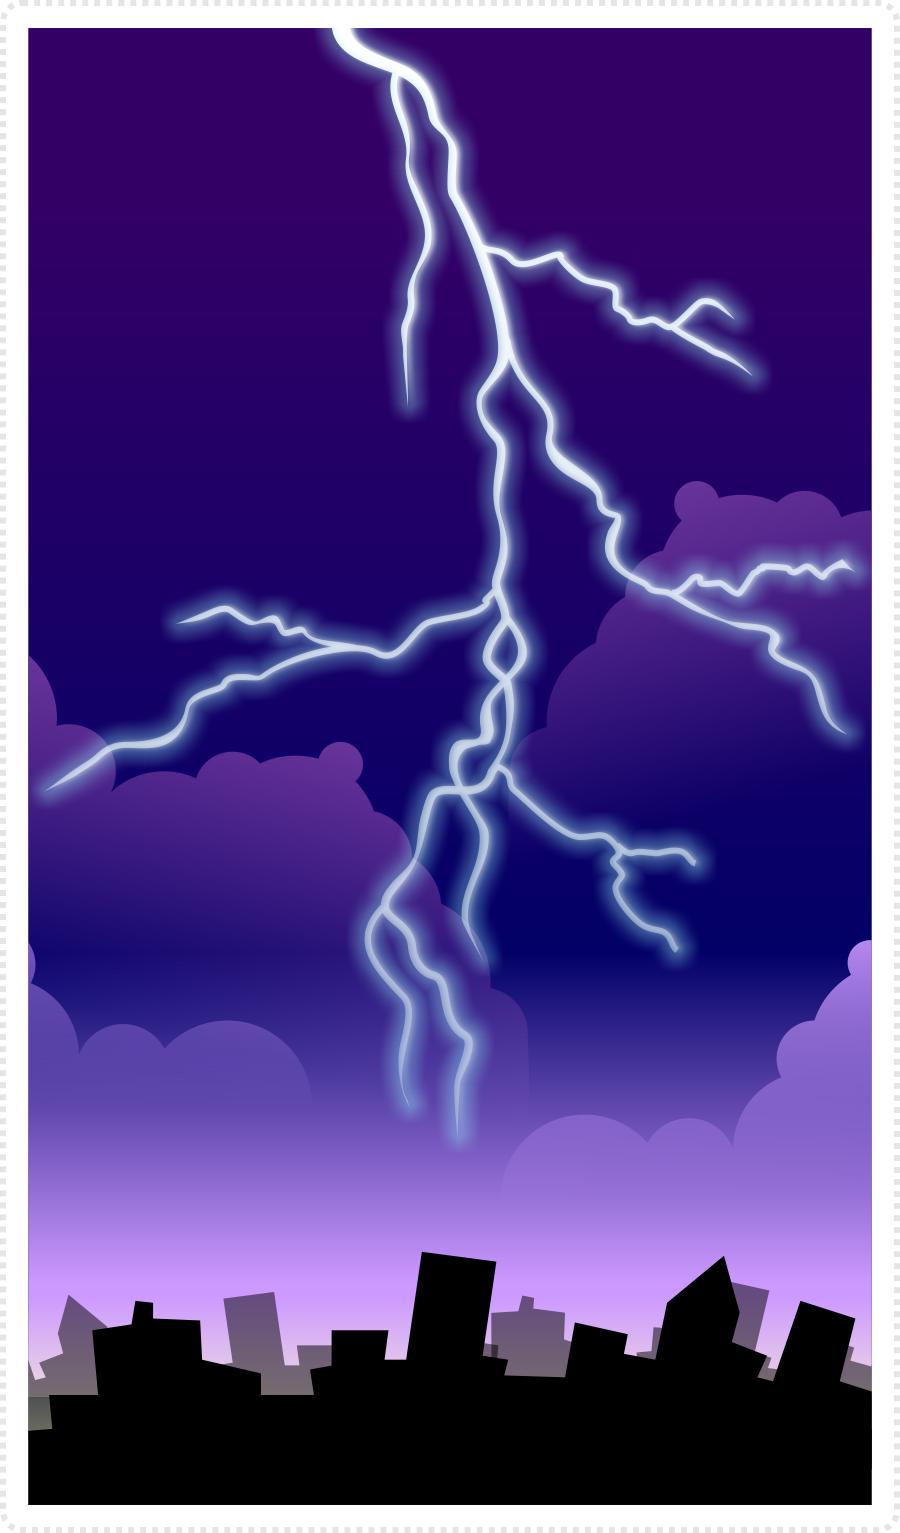 2dgameartguru - designing lightning strikes